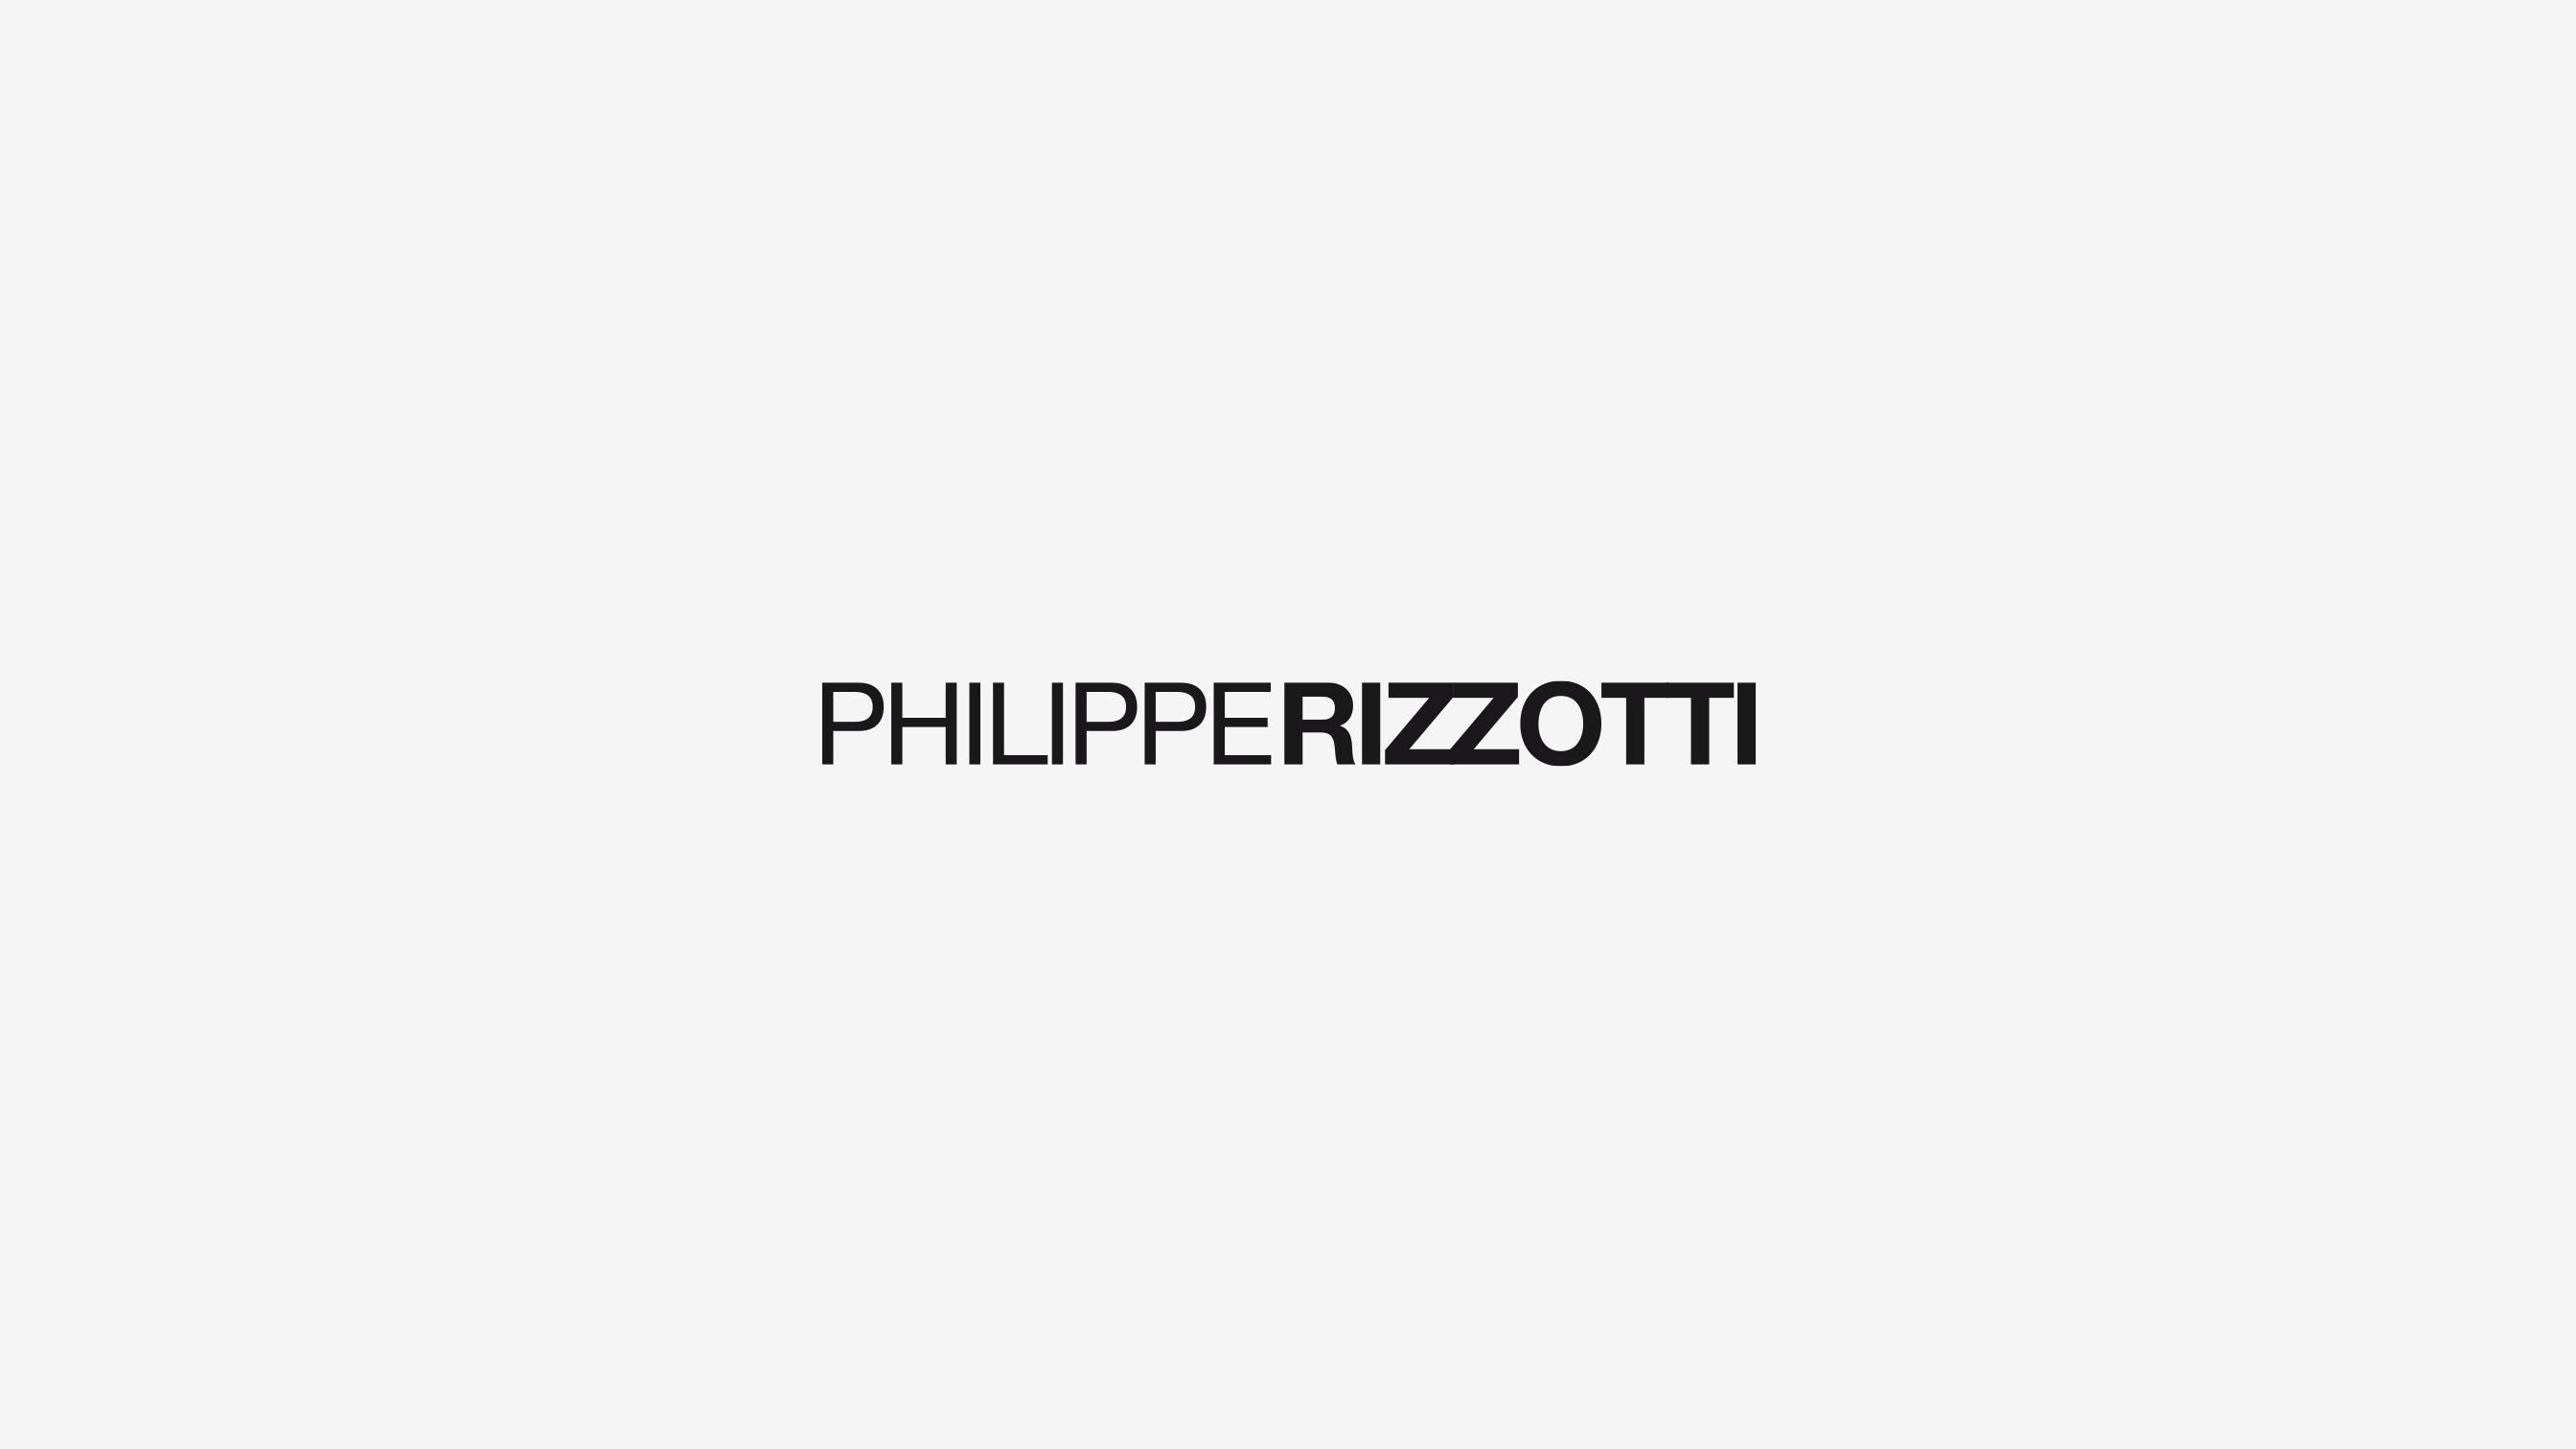 philipperizzotti-logotype-pikteo